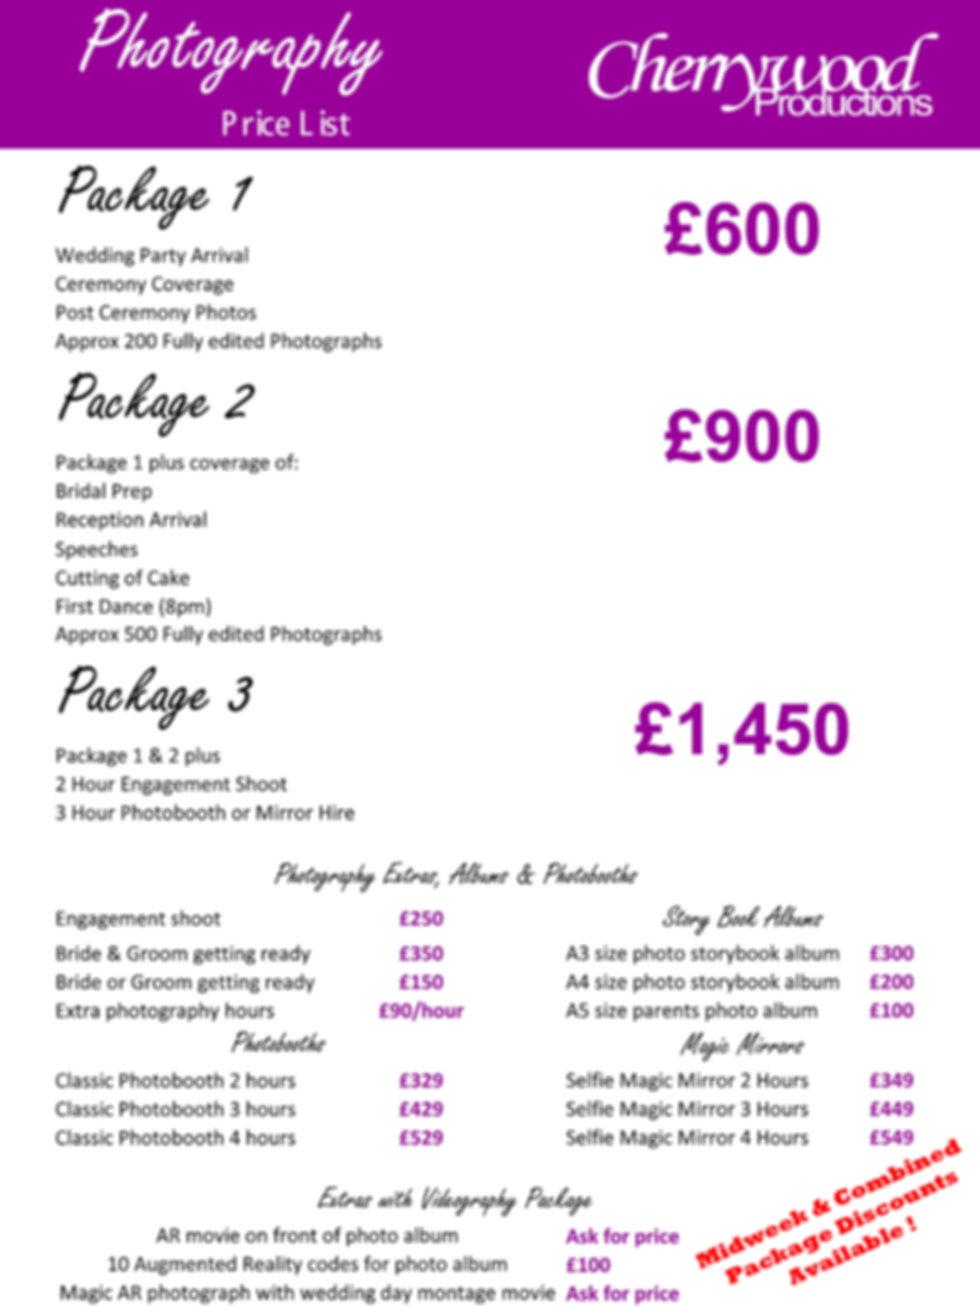 cherrywood Photo price list 2020.jpg